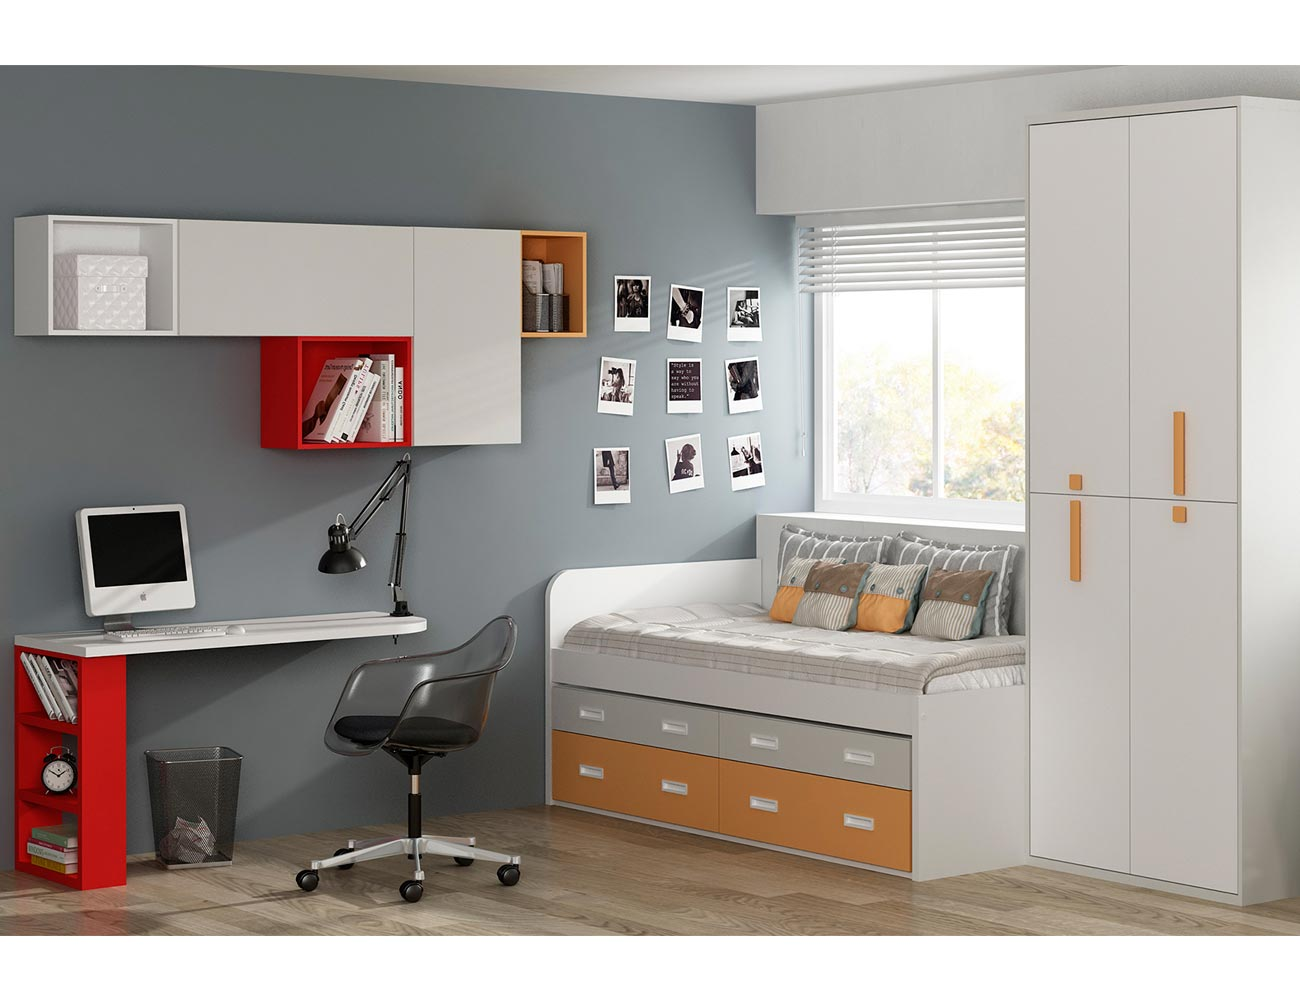 Dormitorio juvenil moderno cama cajones